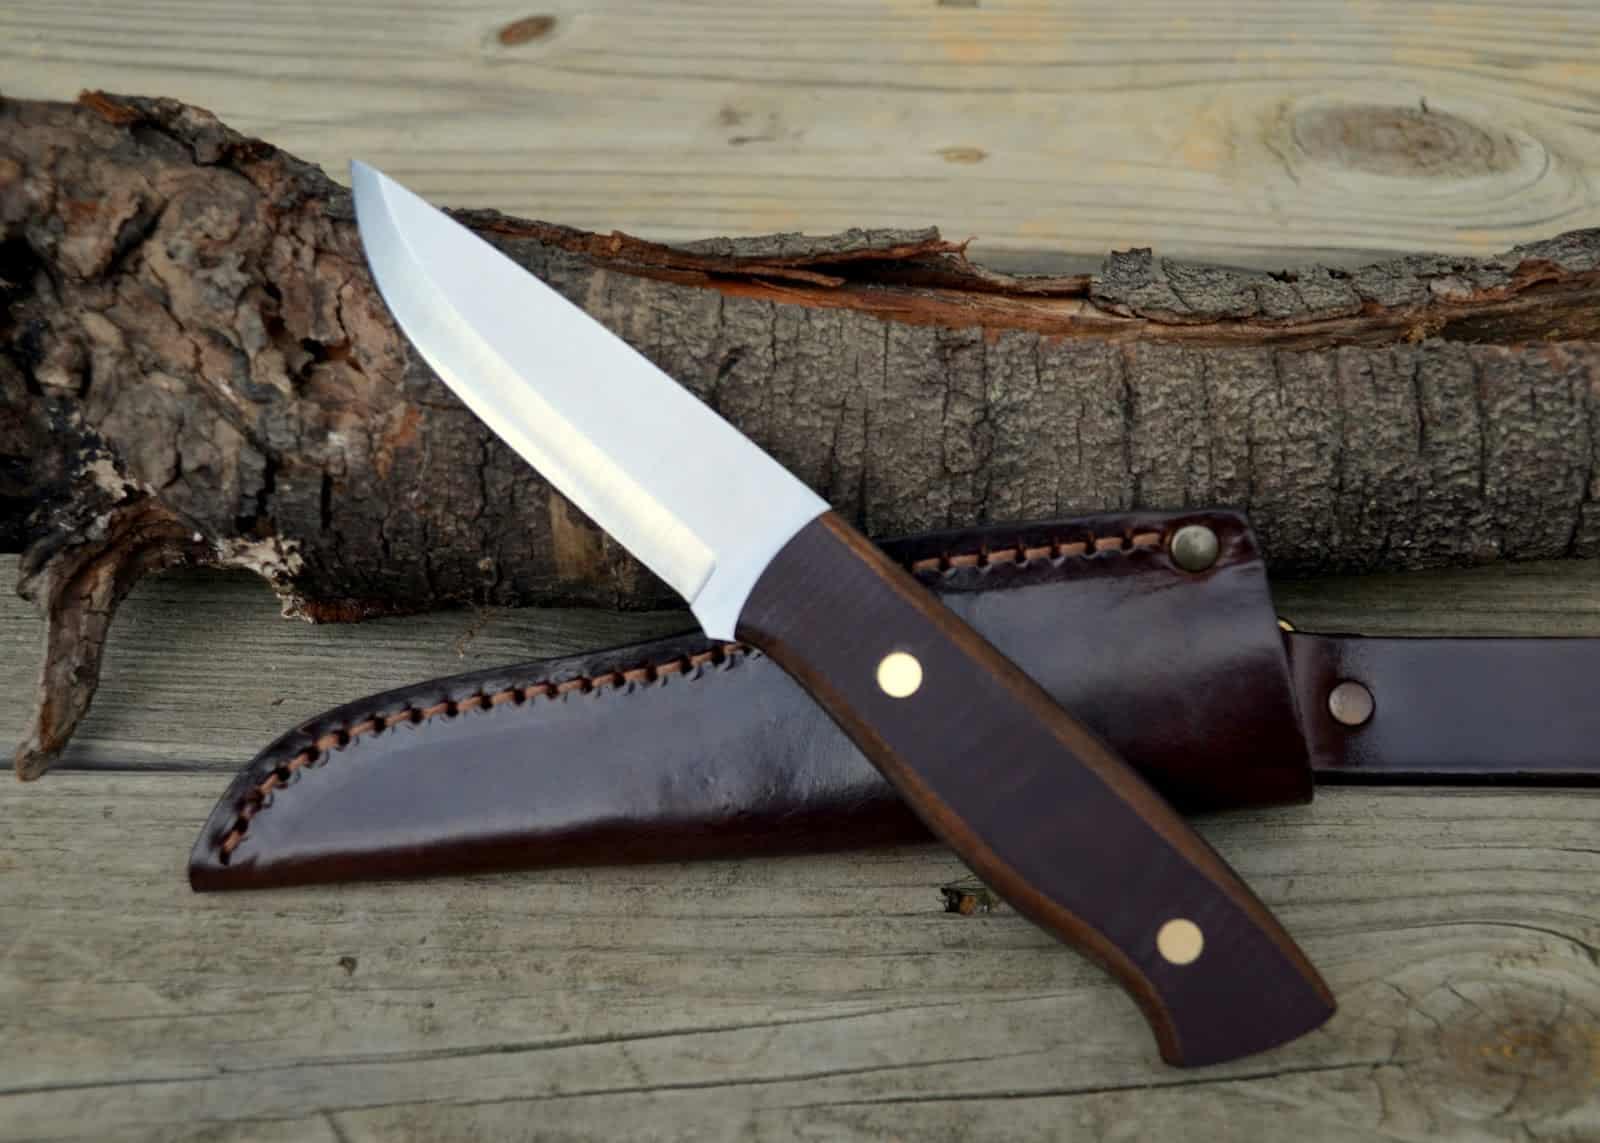 Enzo Trapper – bushcraft knife